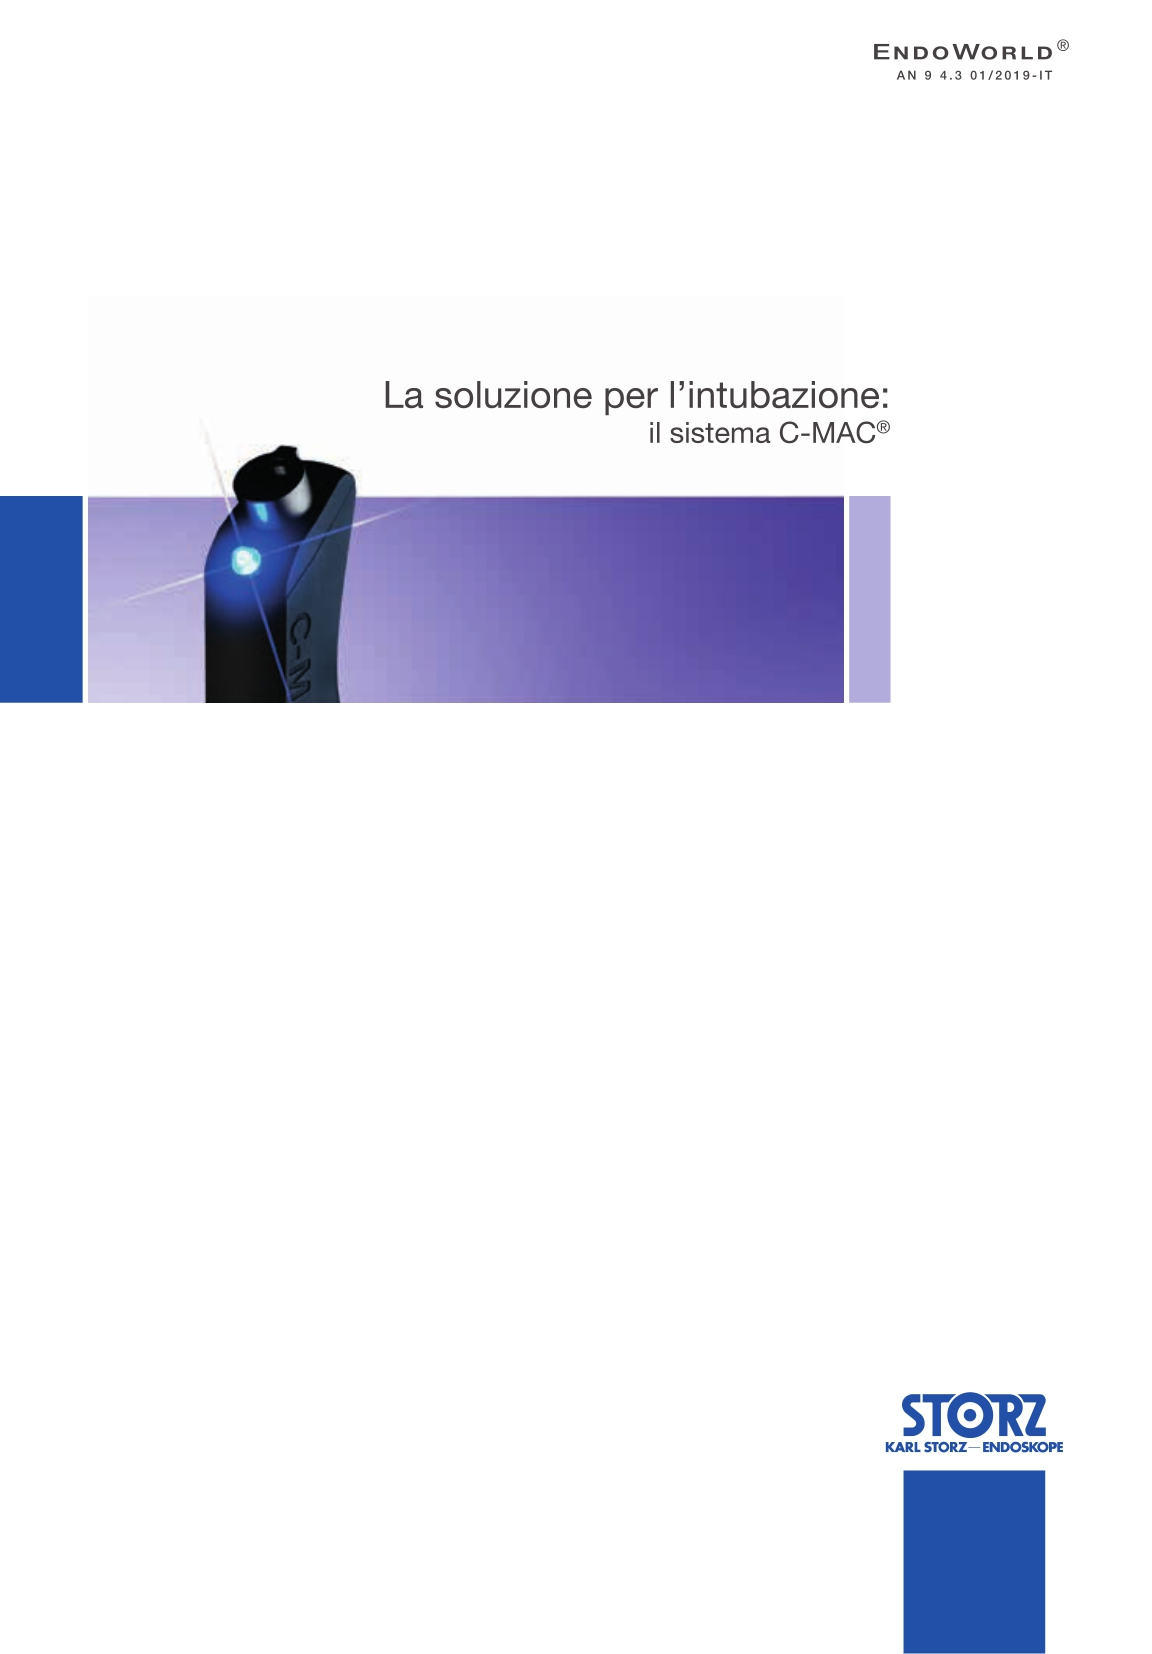 Anestesia e medicina d'emergenza - Piattaforma per intubazione Video guidata C-MAC®